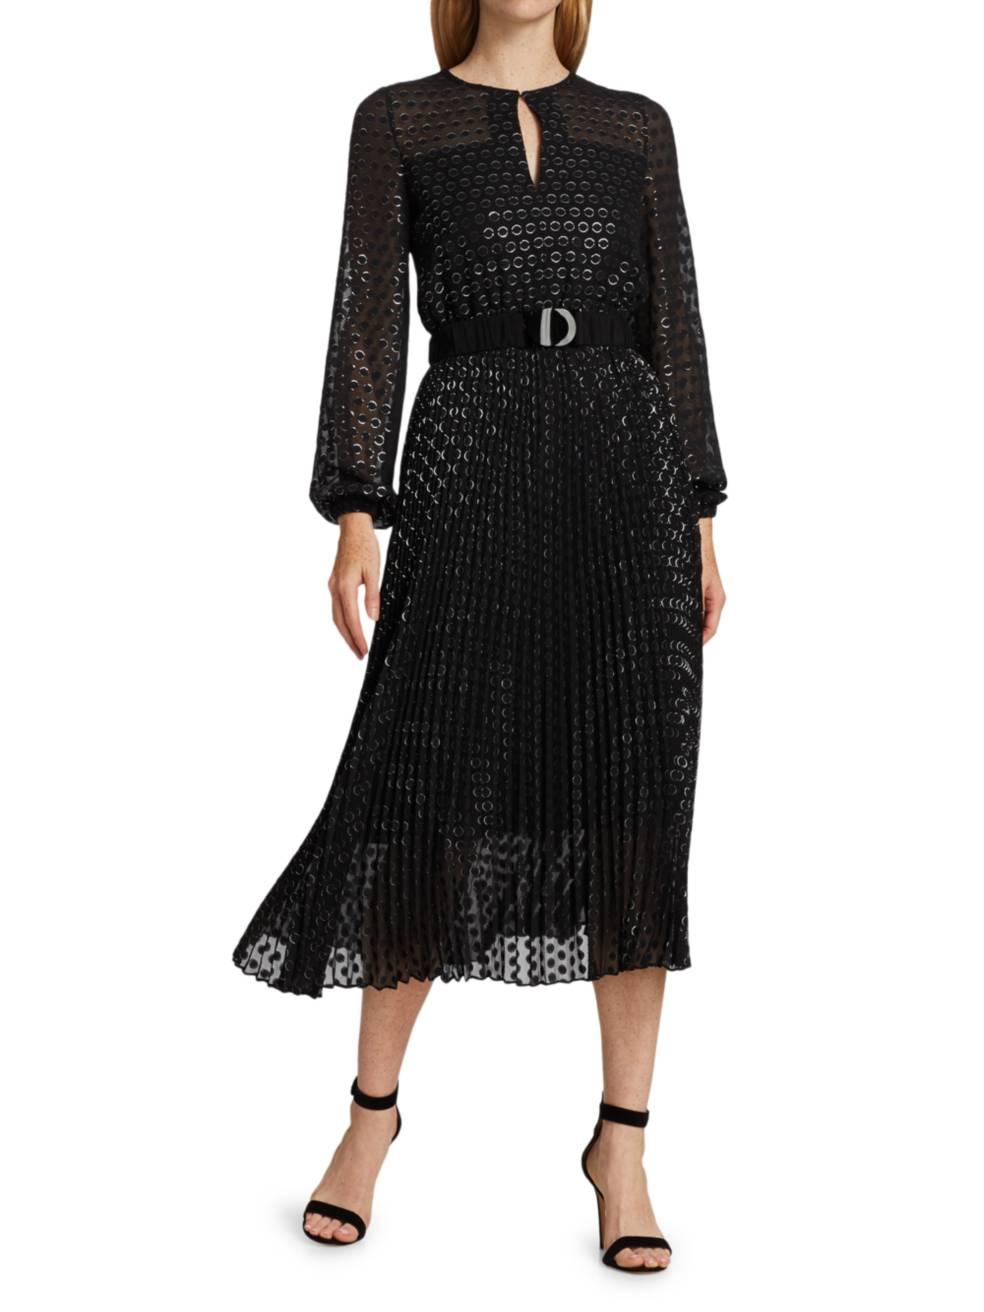 AKRIS PUNTO Devore Pleated Metallic Dot Dress